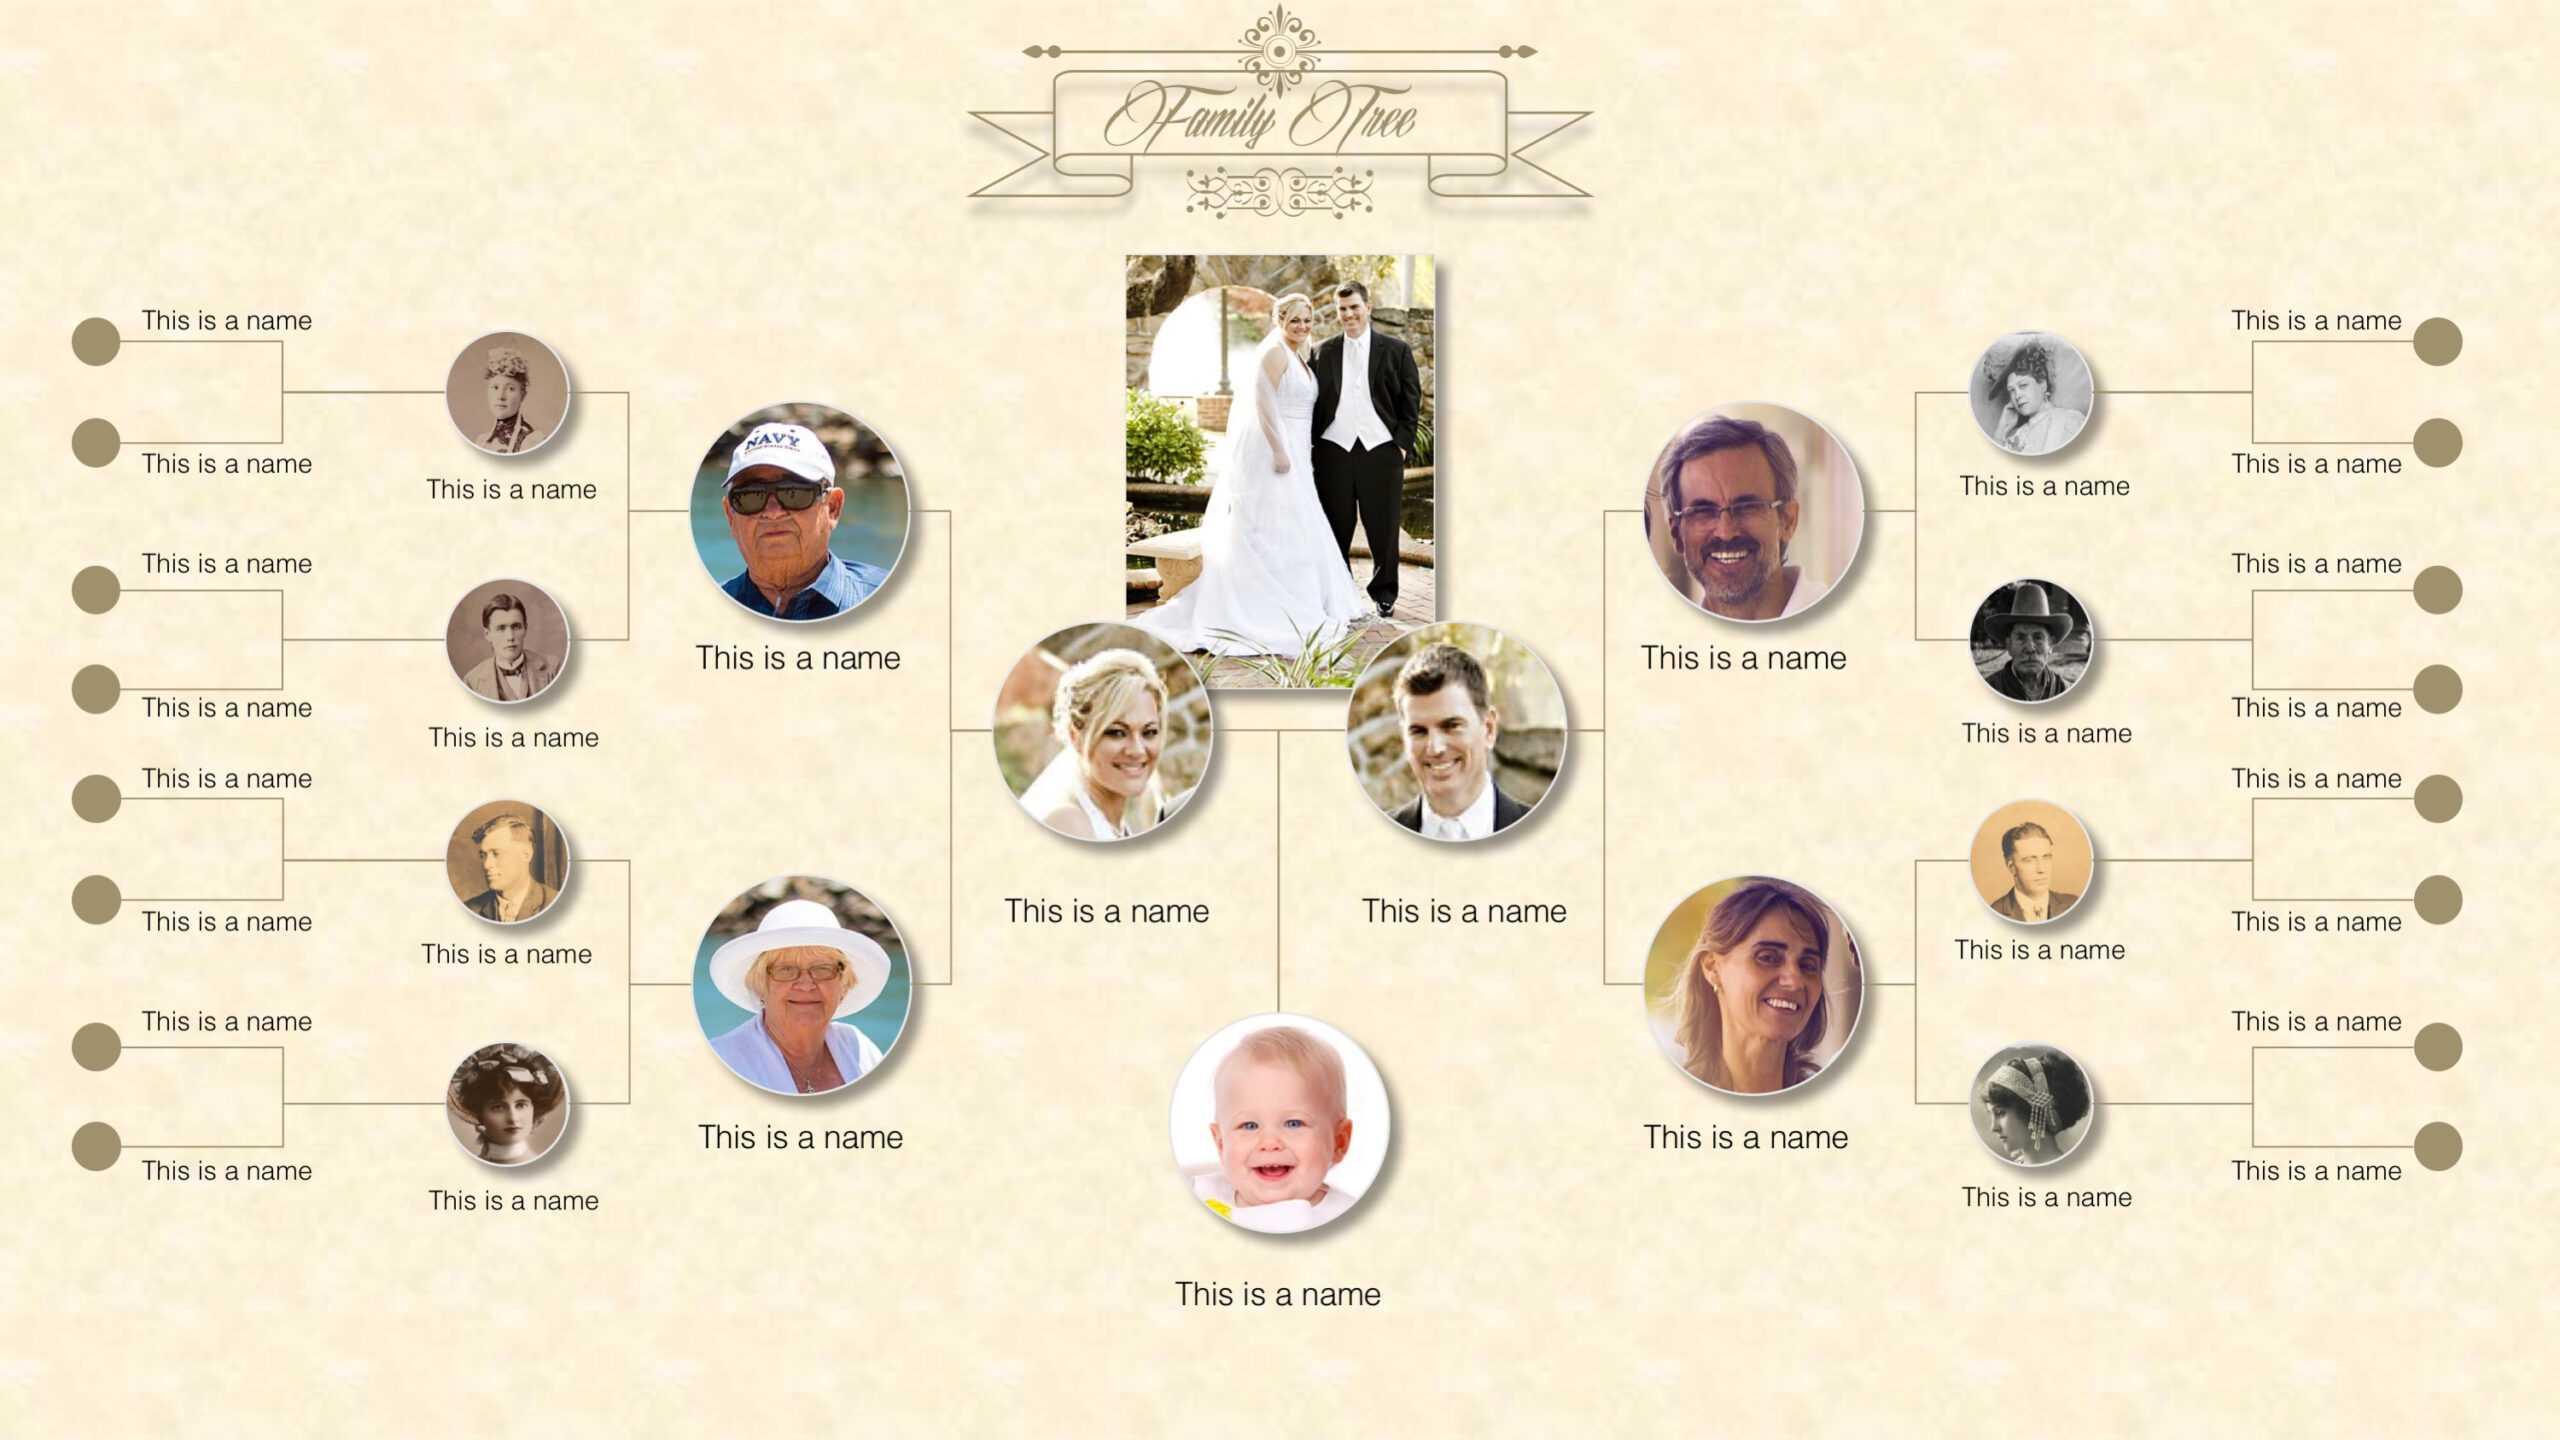 Family Tree Powerpoint Templates Regarding Powerpoint Genealogy Template